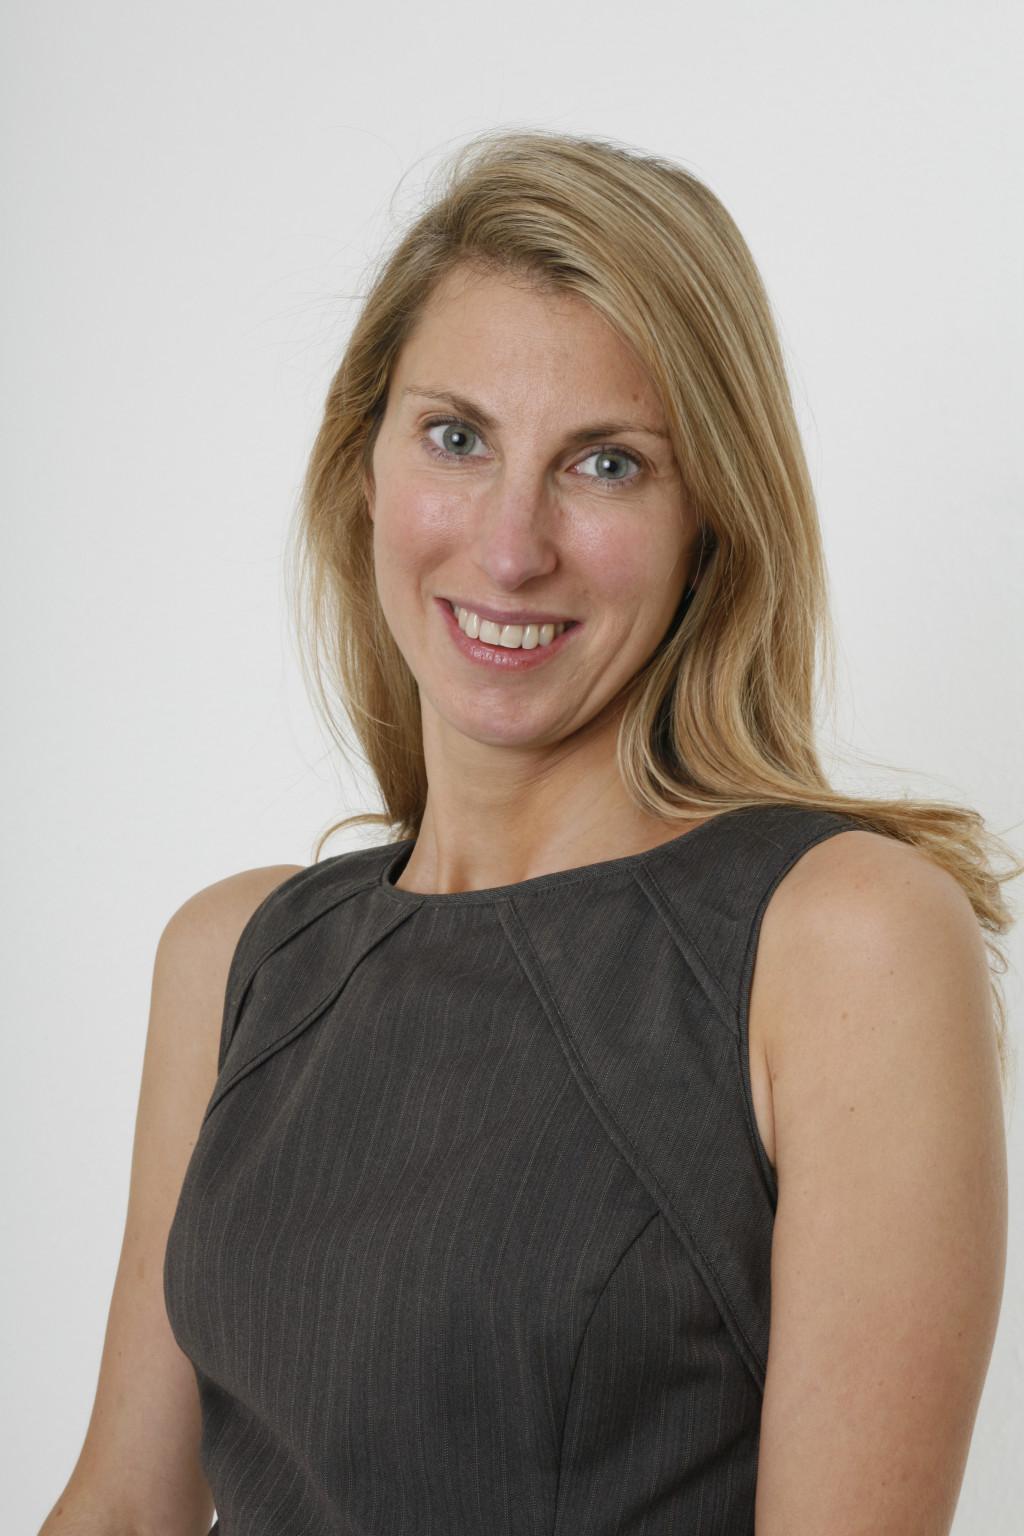 Photograph of Isabella Stefanutti